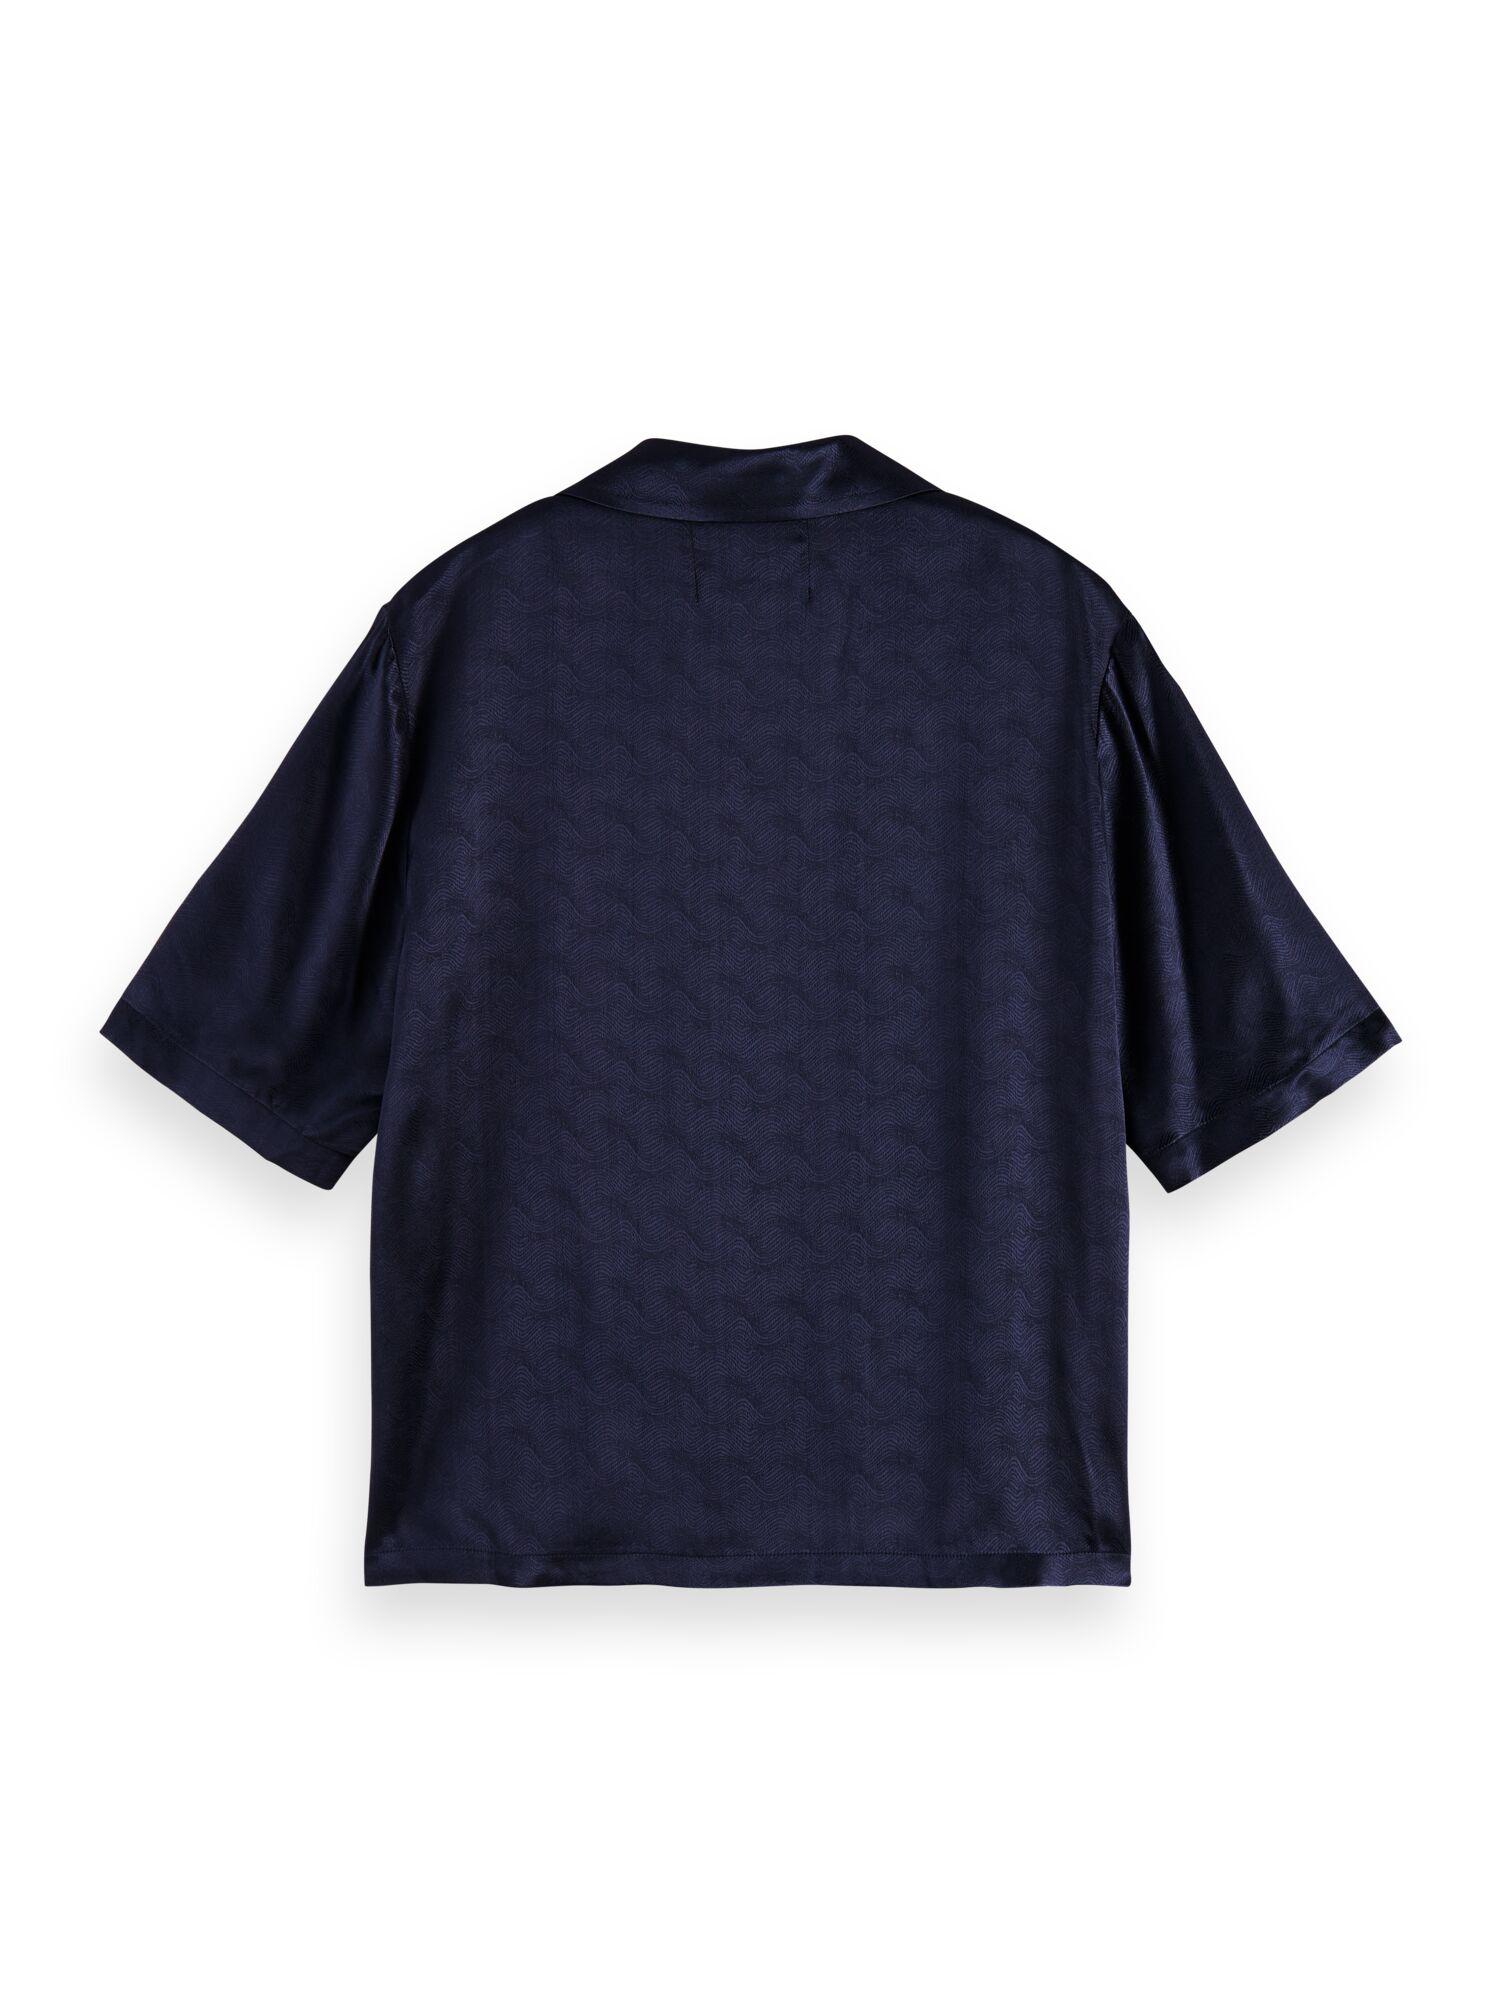 Scotch & Soda   Short sleeve shirt in wave jacquard quality